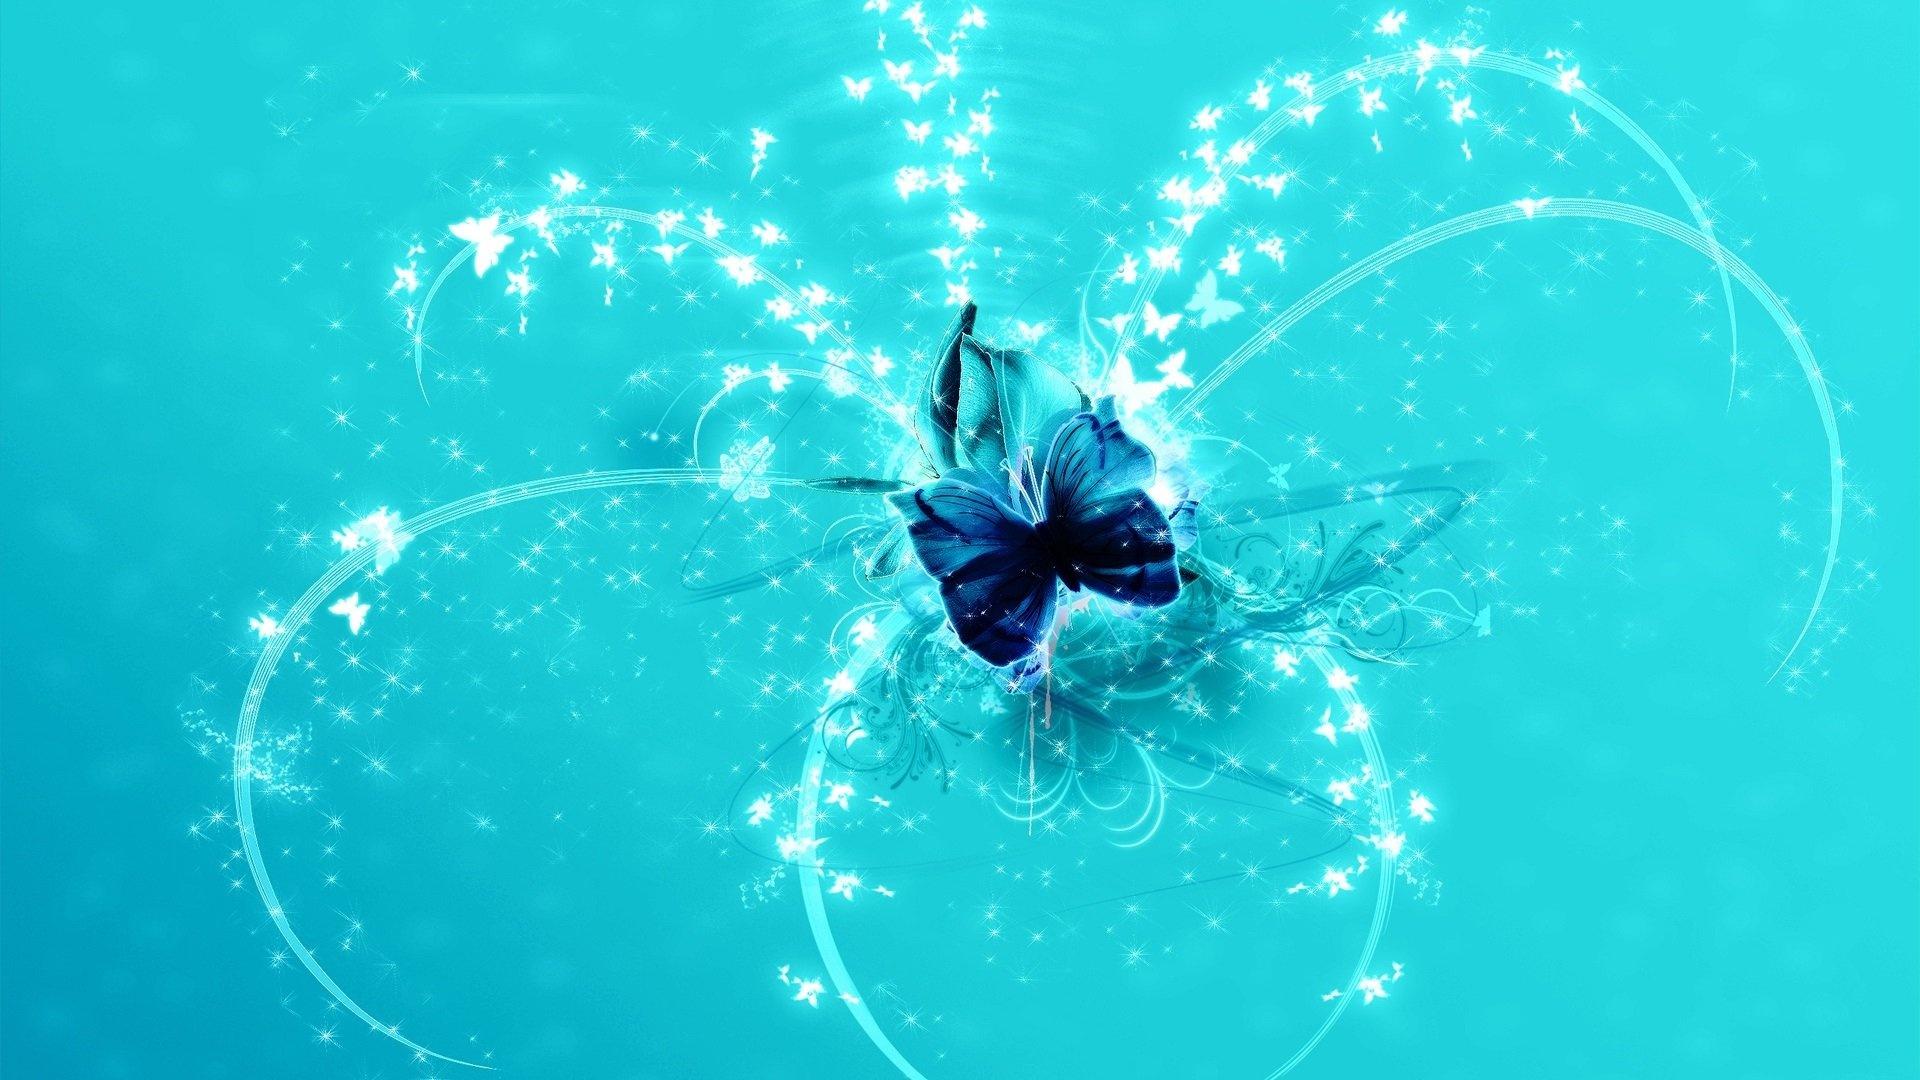 Butterfly windows background